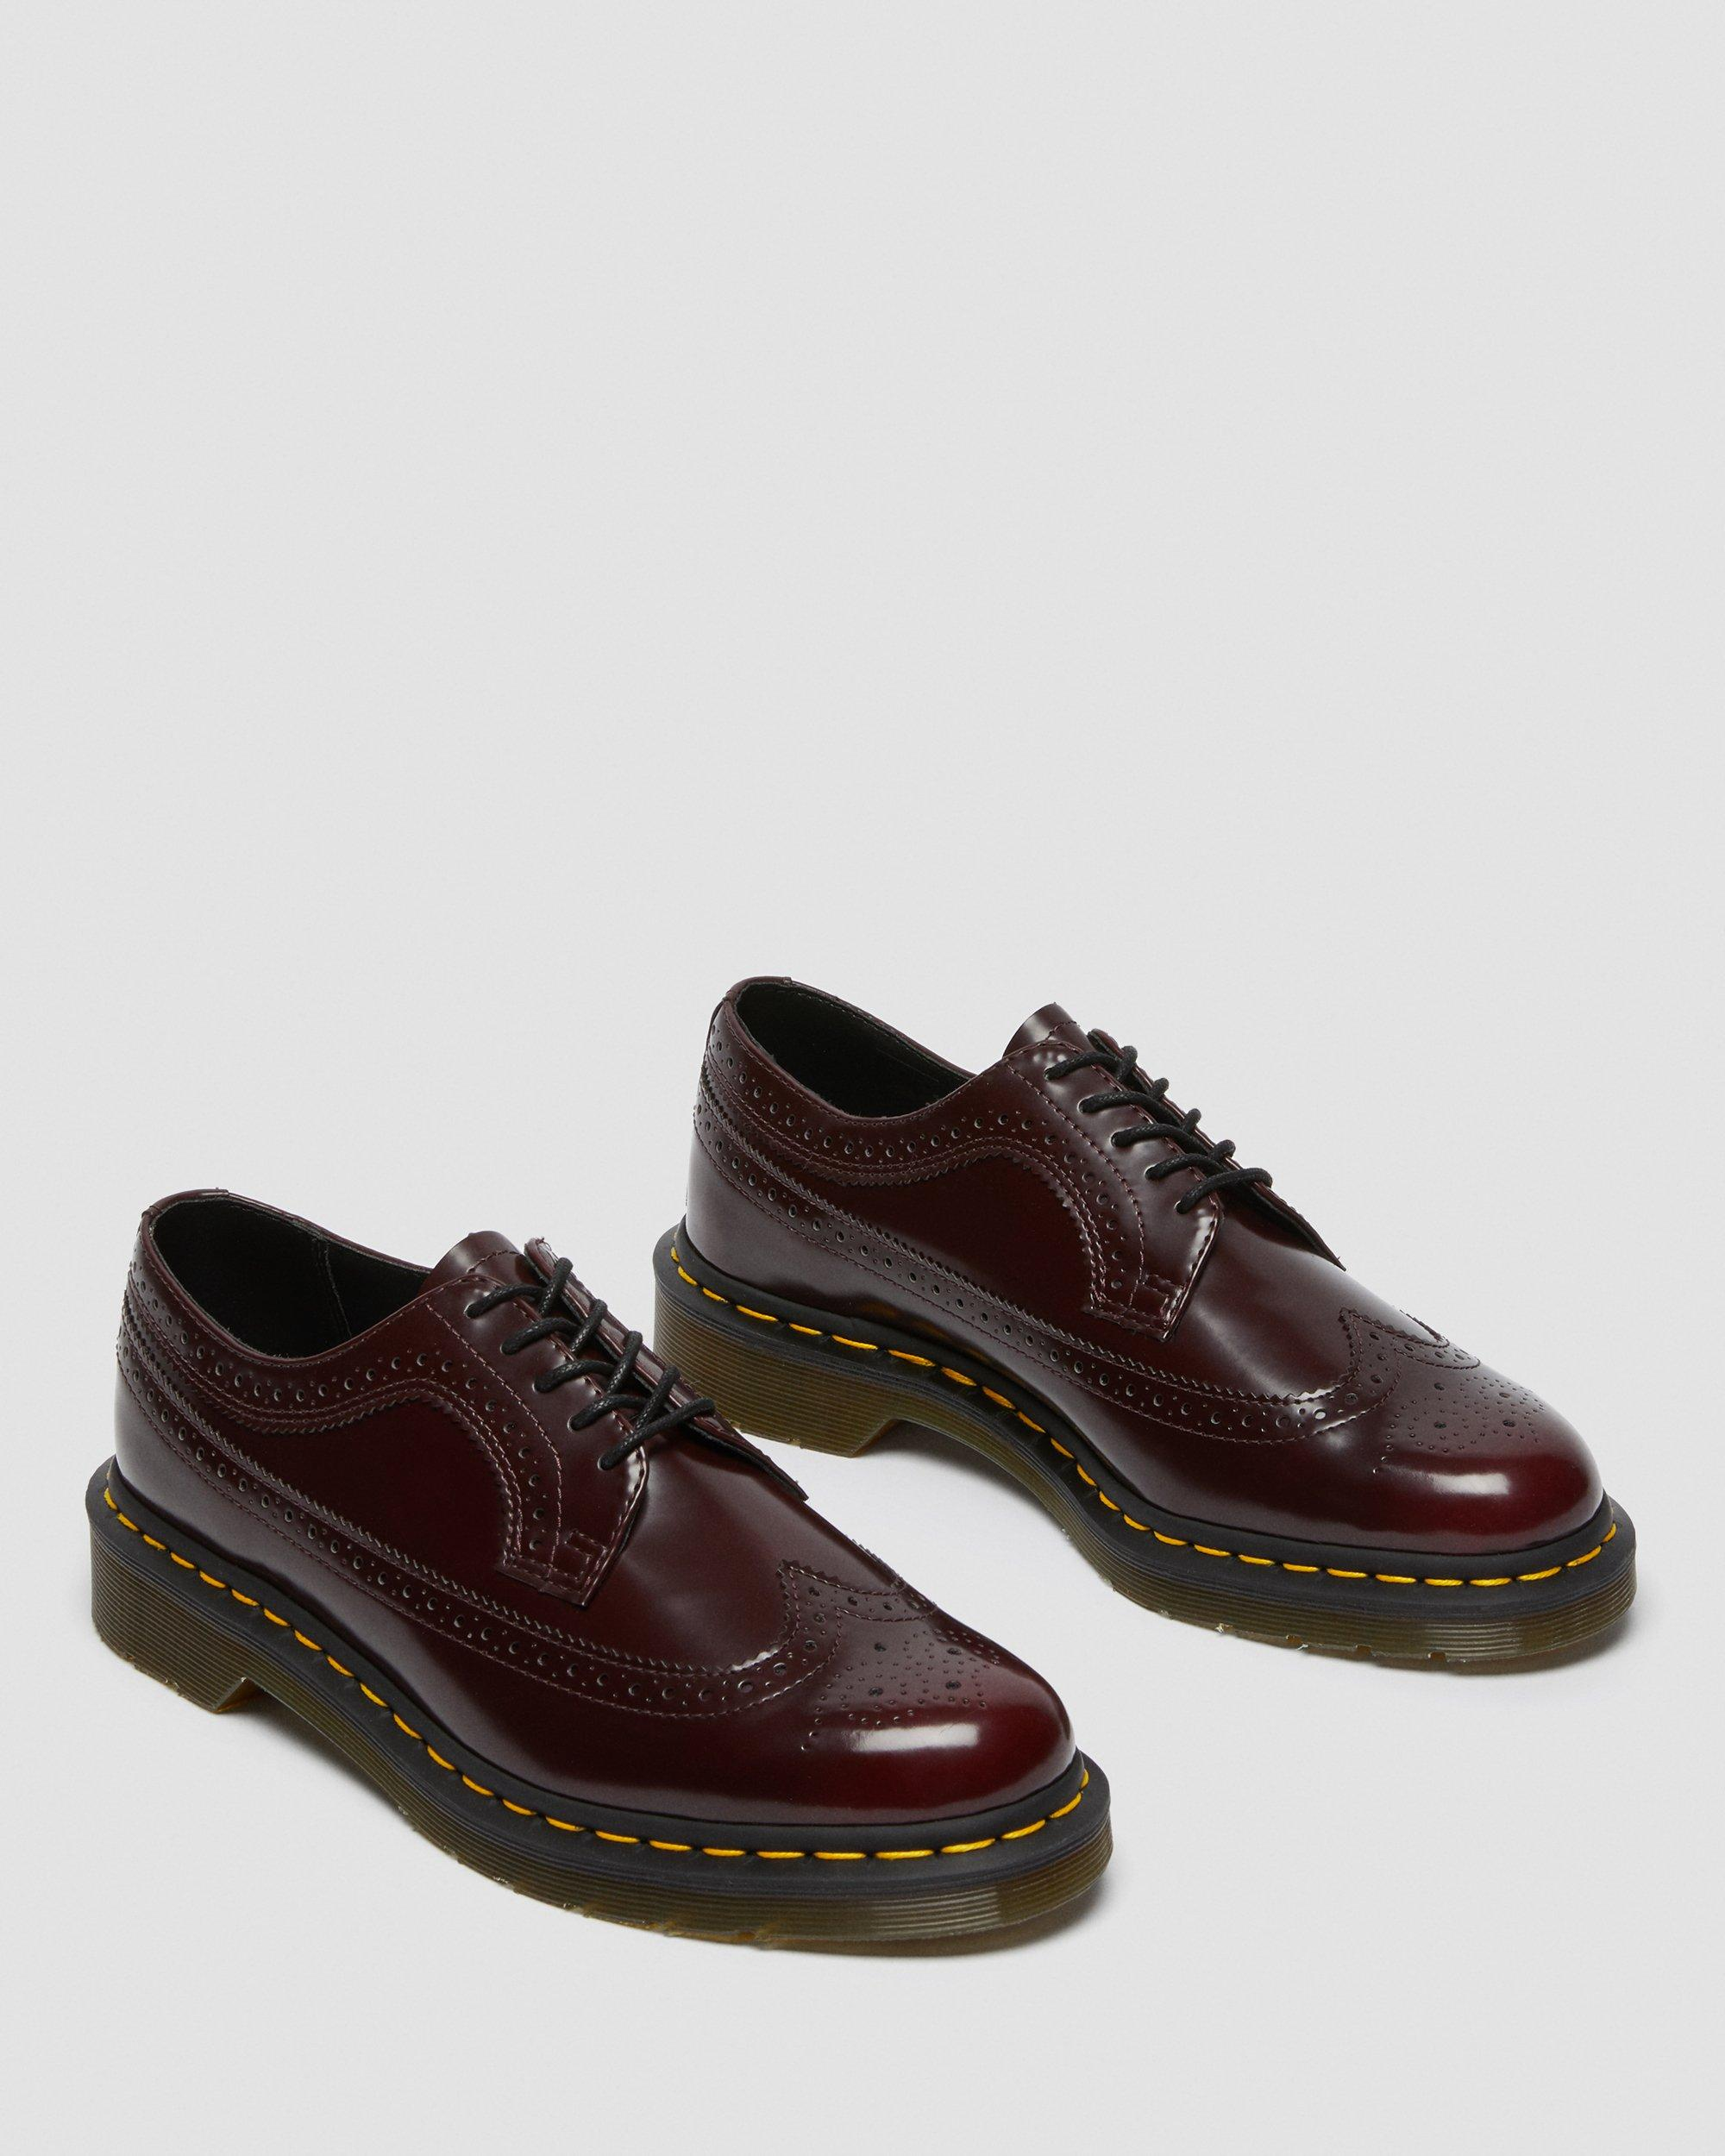 Cherry Red Oxford Brush Dr Martens Vegan 3989 | Summer Shoes